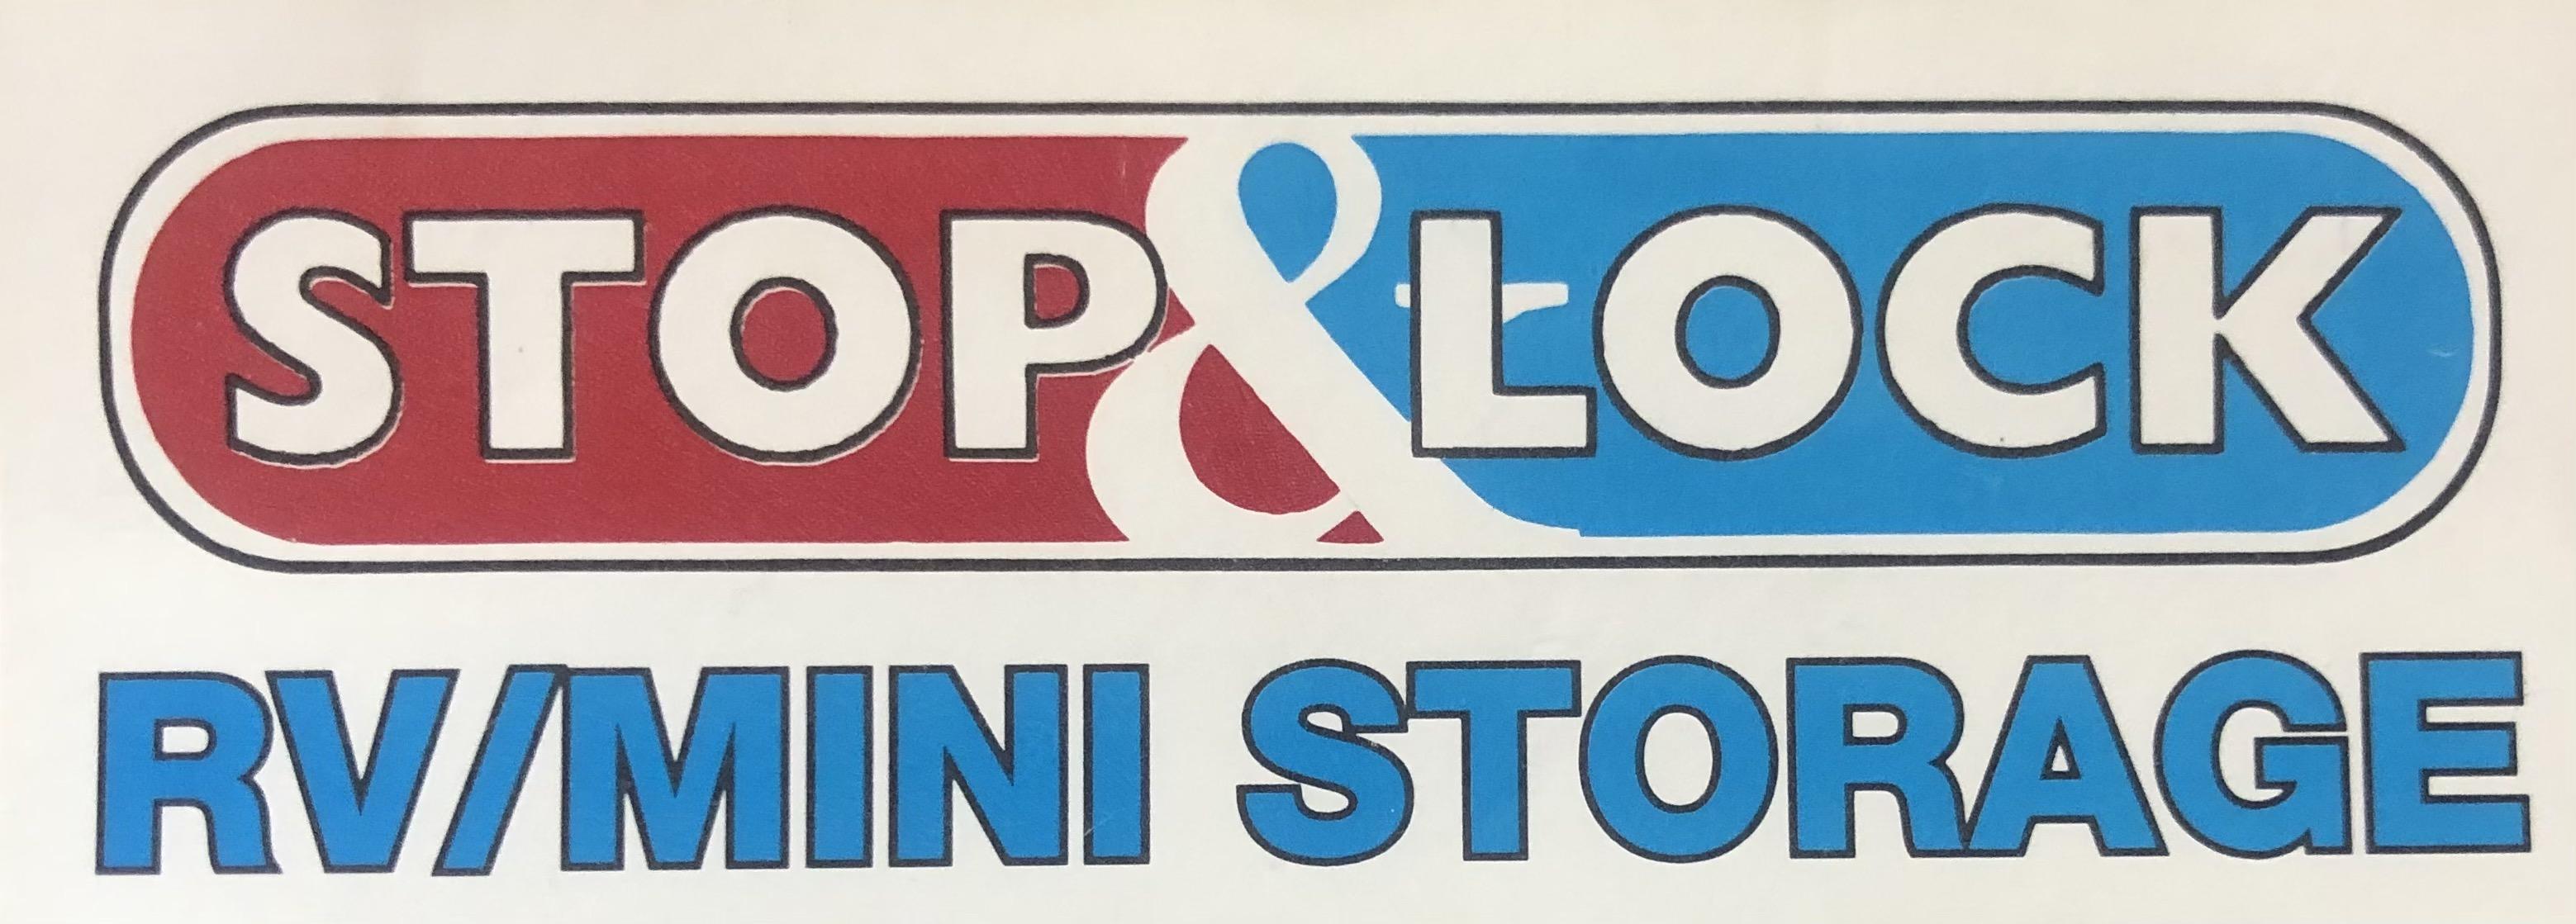 Stop & Lock RV Mini Storage in Rio Linda, CA